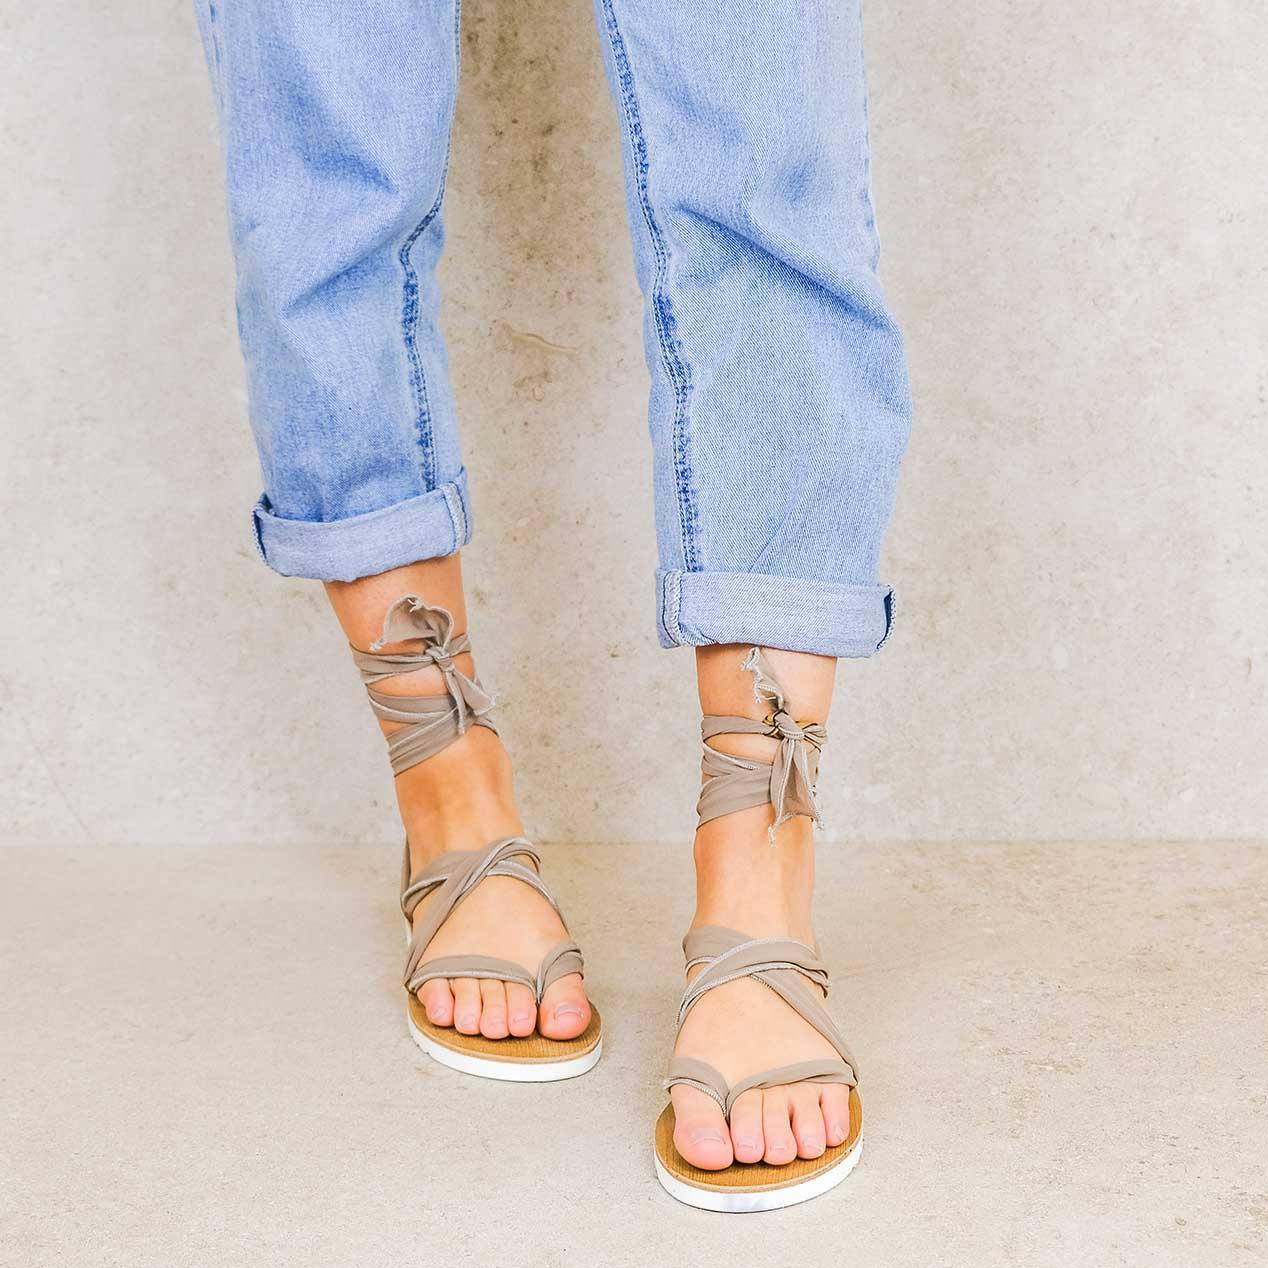 Mocha_elegance ribbons linten lintsandalen sandals travelsandals vegan sustainable sandals wikkelsandalen